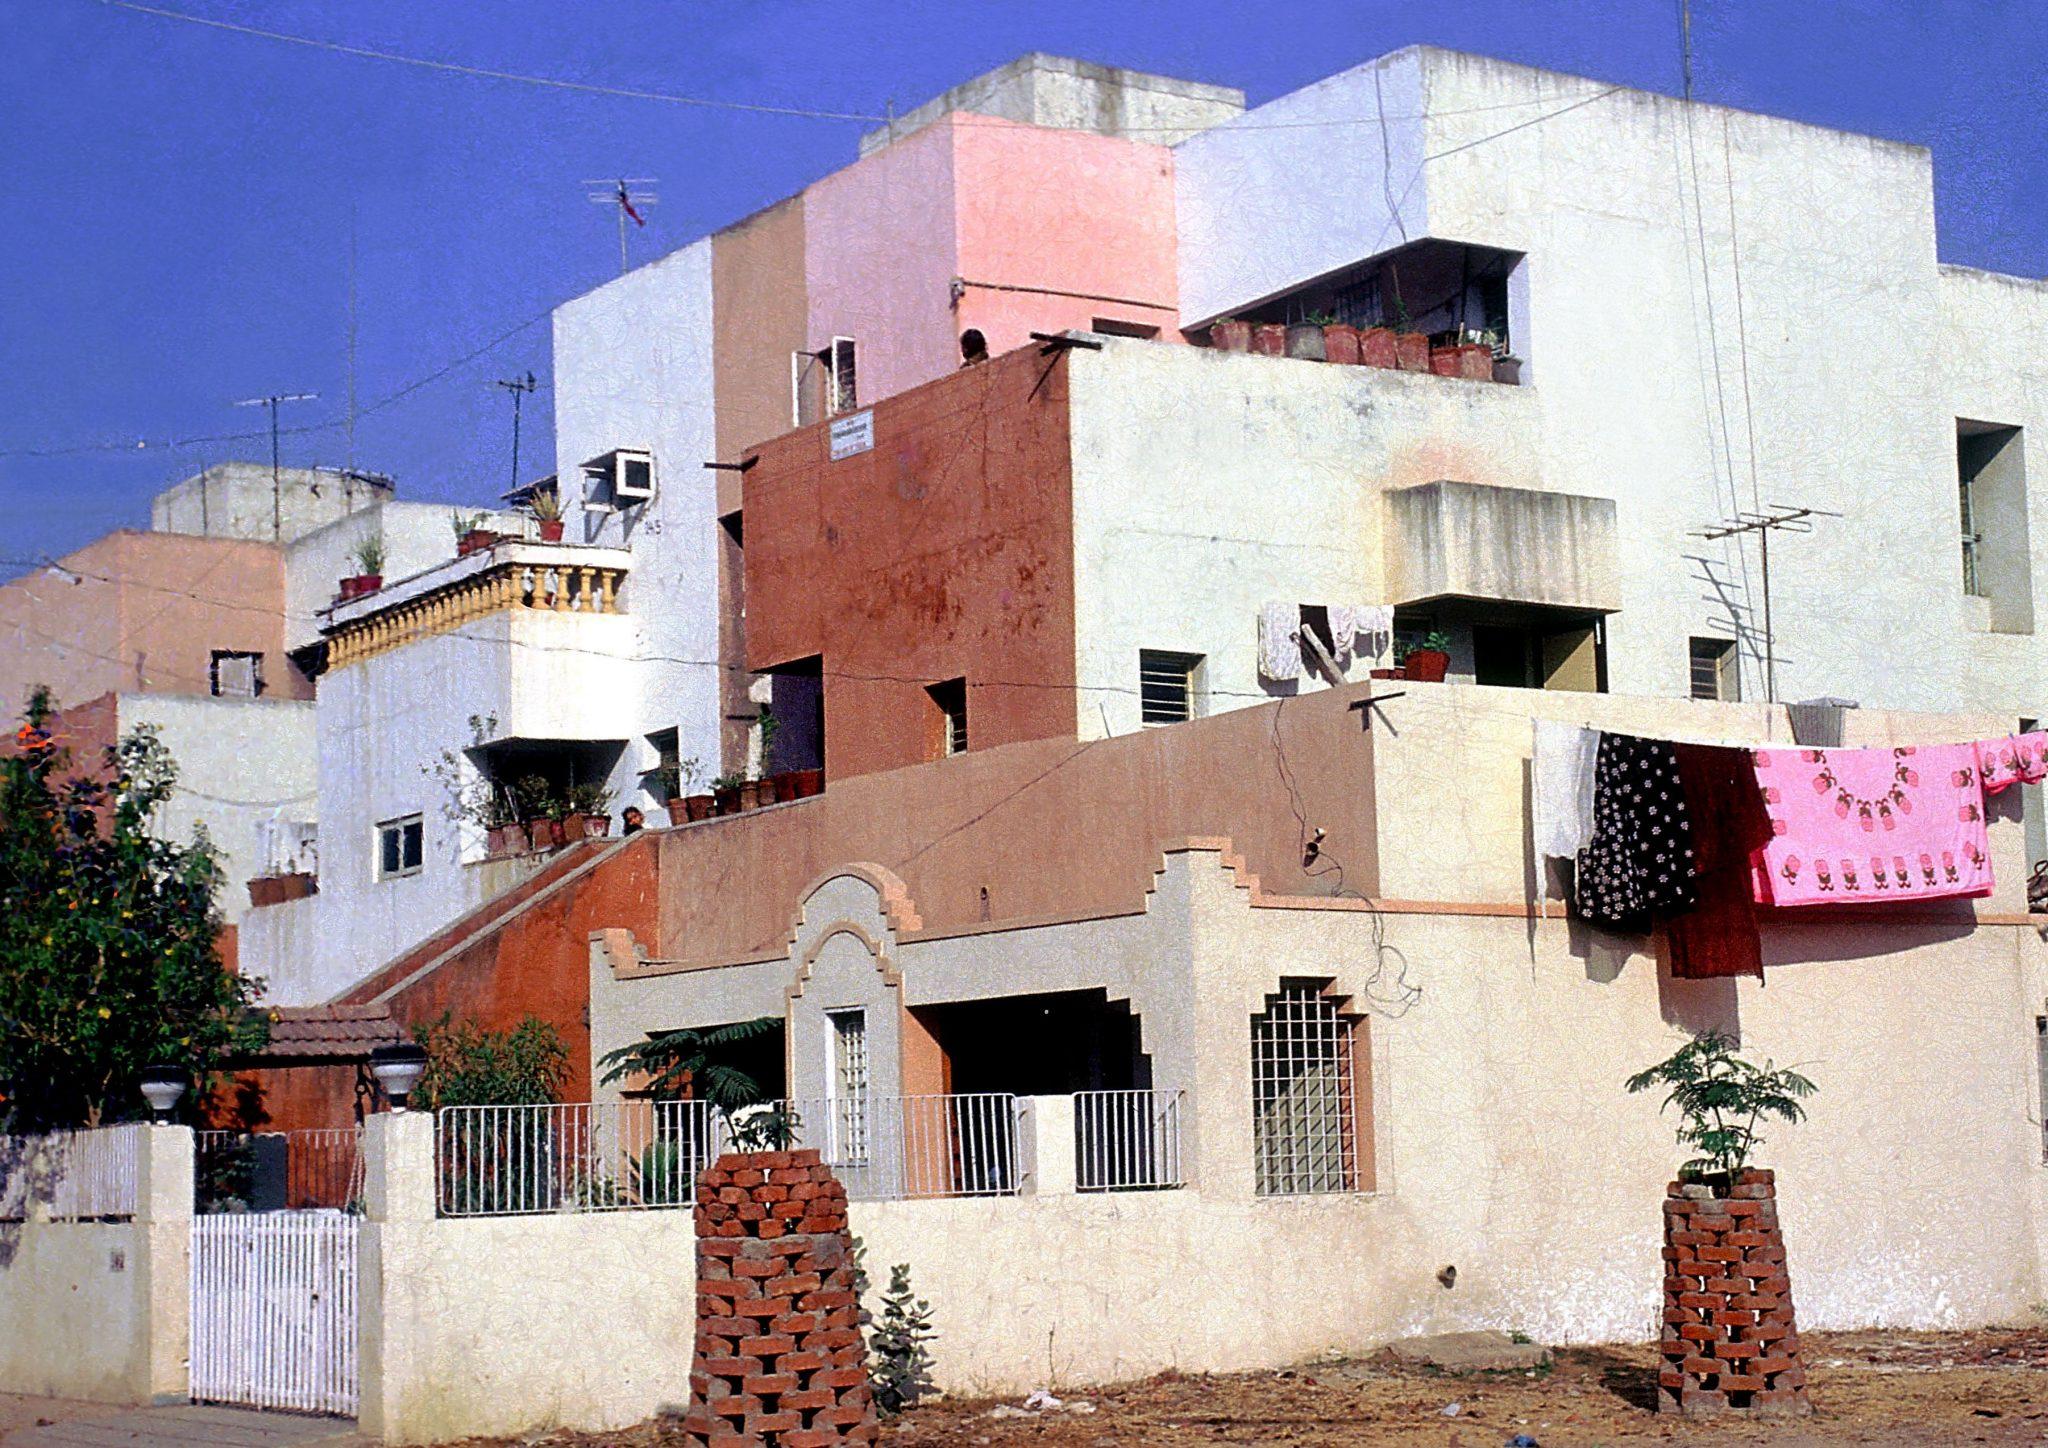 Life Insurance Corporation Housing (photo courtesy of VSF)